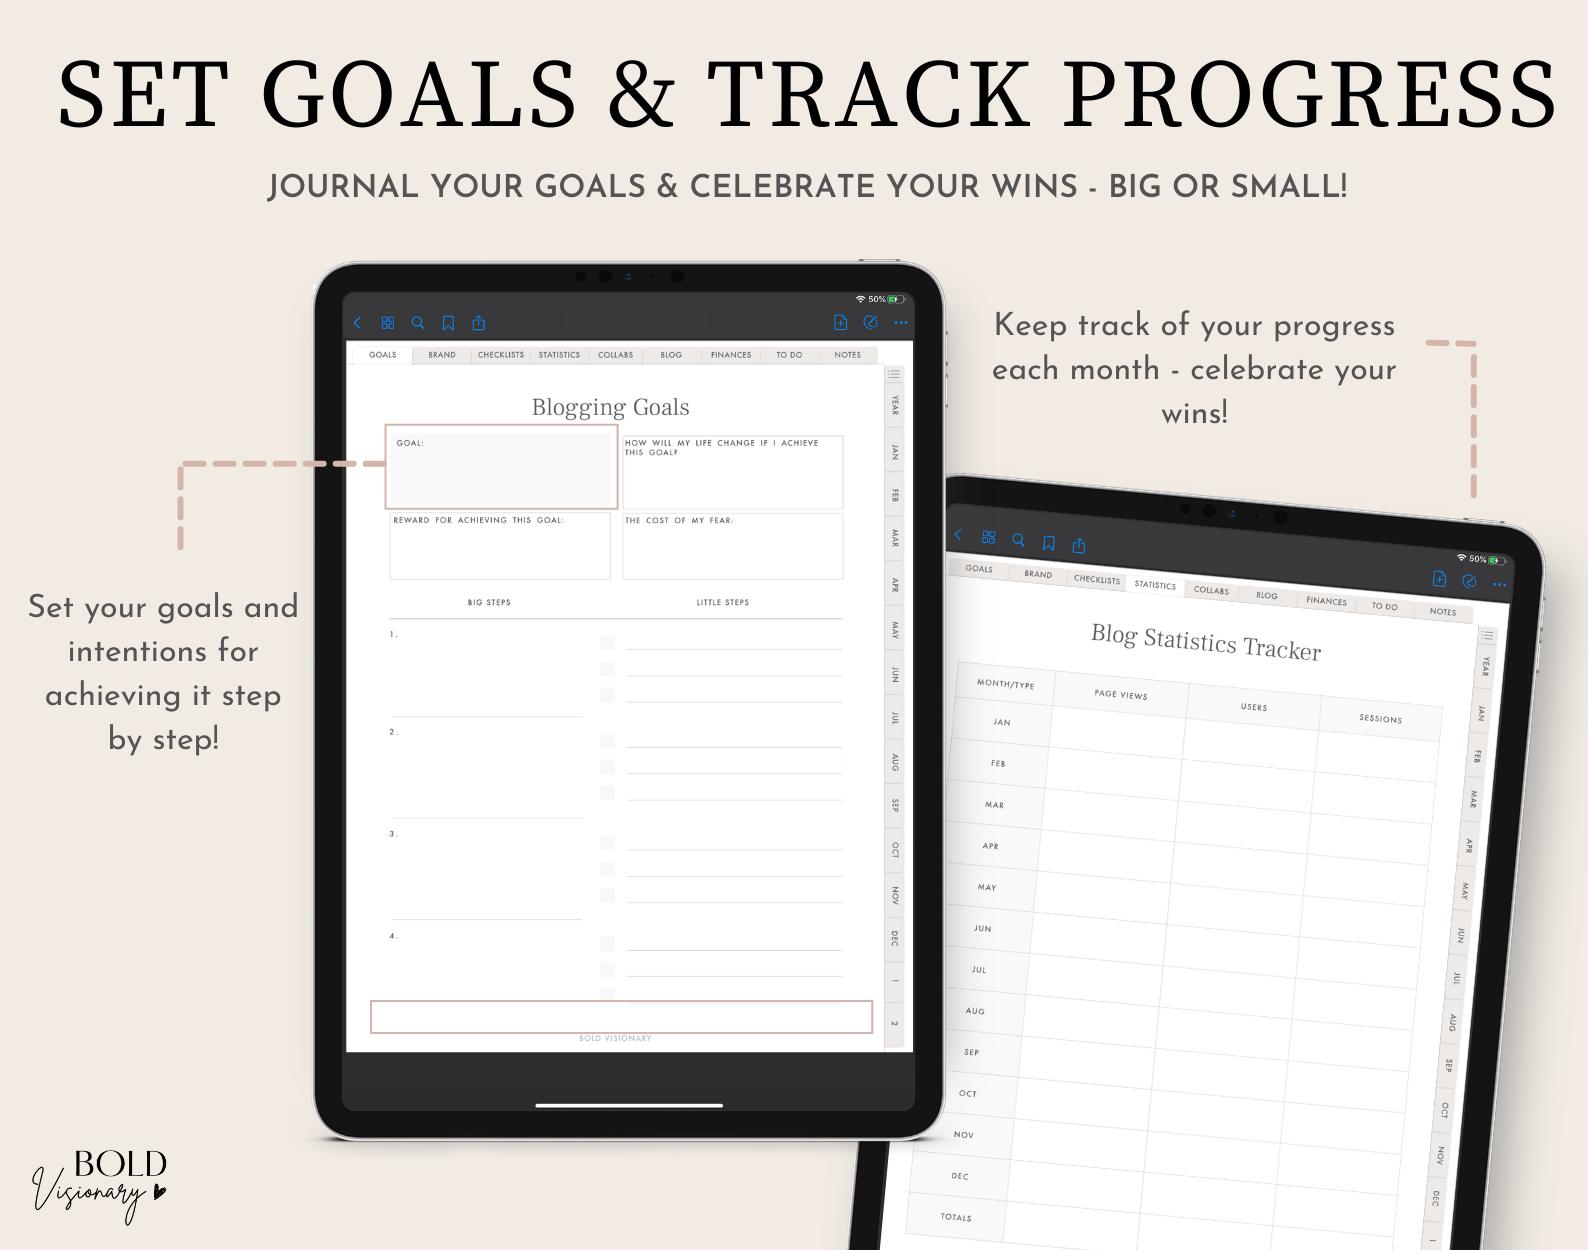 4Goals-Bold-Visionary-Digital-Blog-Planner